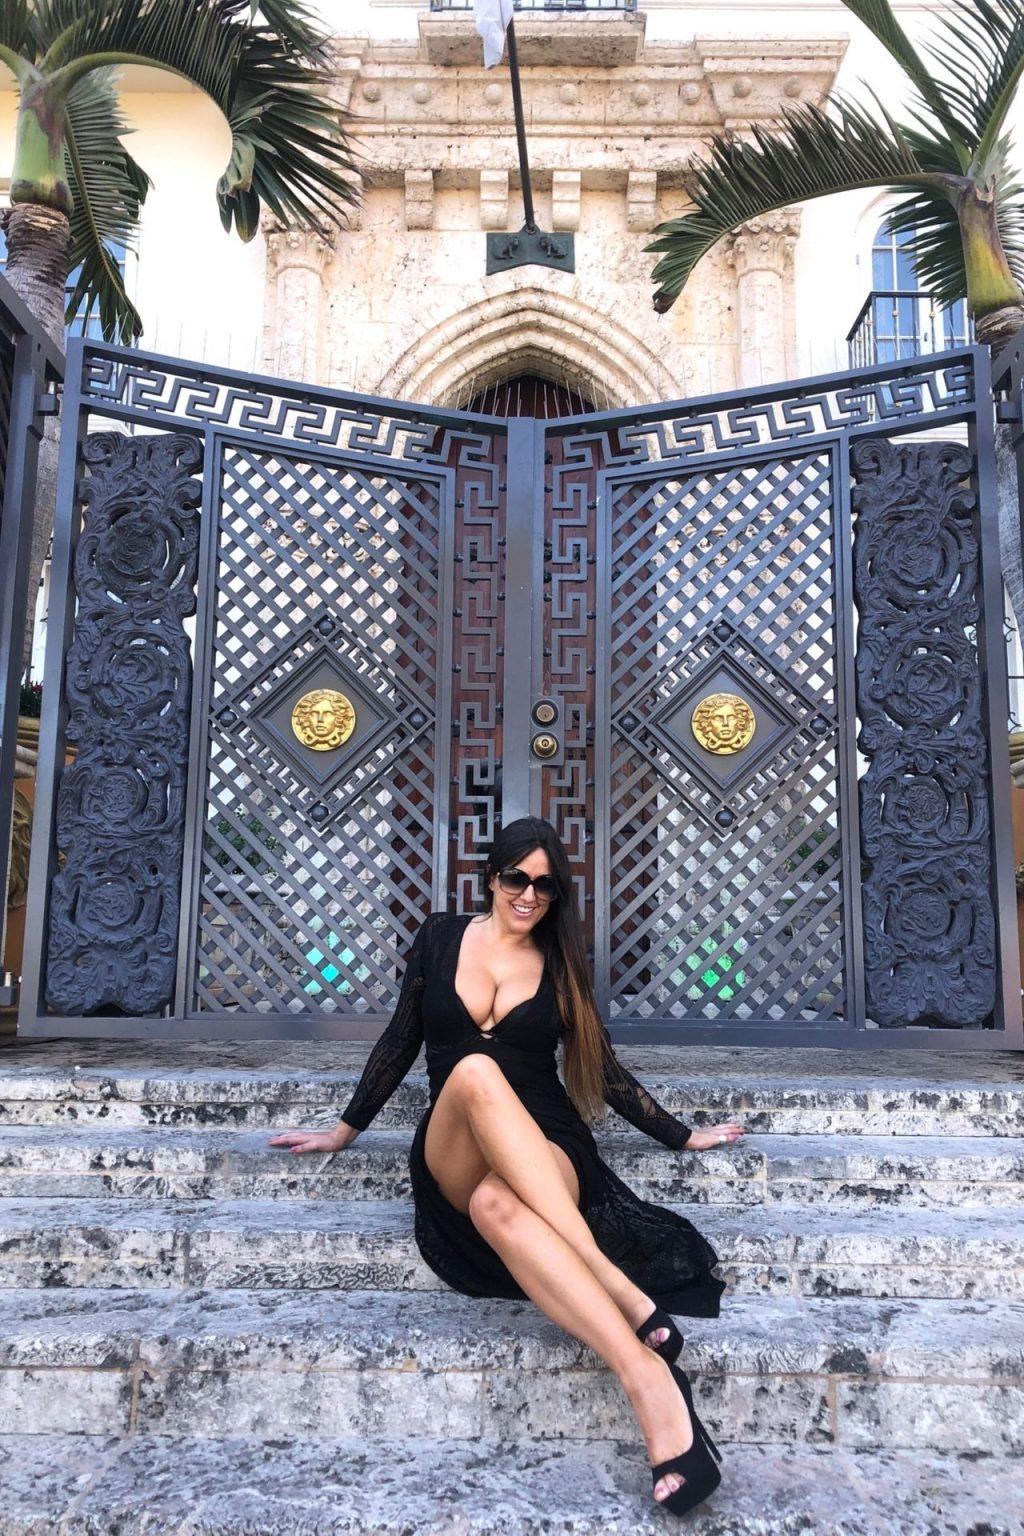 Claudia Romani Poses by SoBe Landmark (16 Photos)